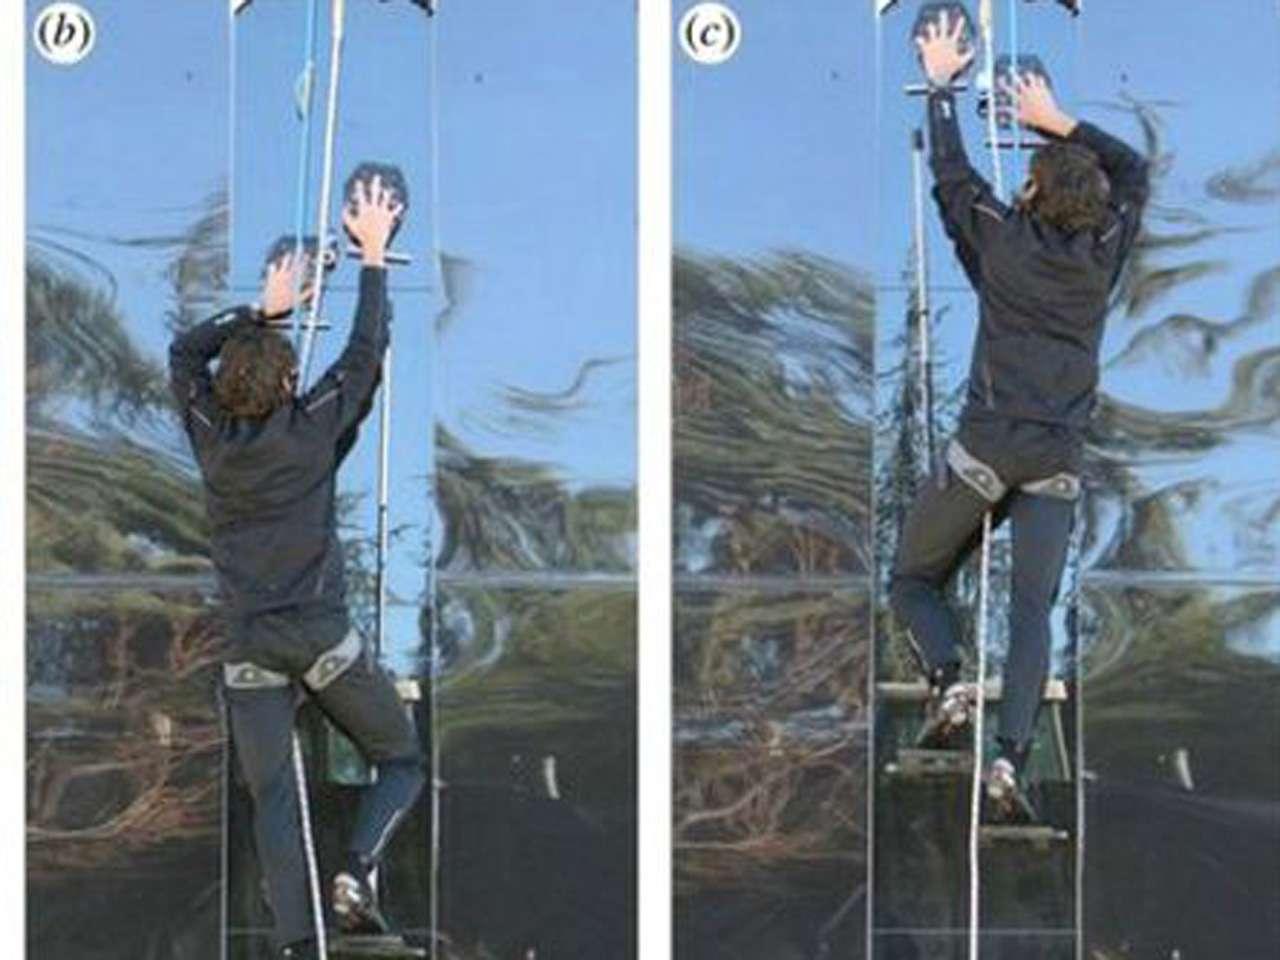 El guante le permitió trepar a un hombre de 70 kilos una pared de vidrio de 3,6 metros de altura. Foto: BBCMundo.com